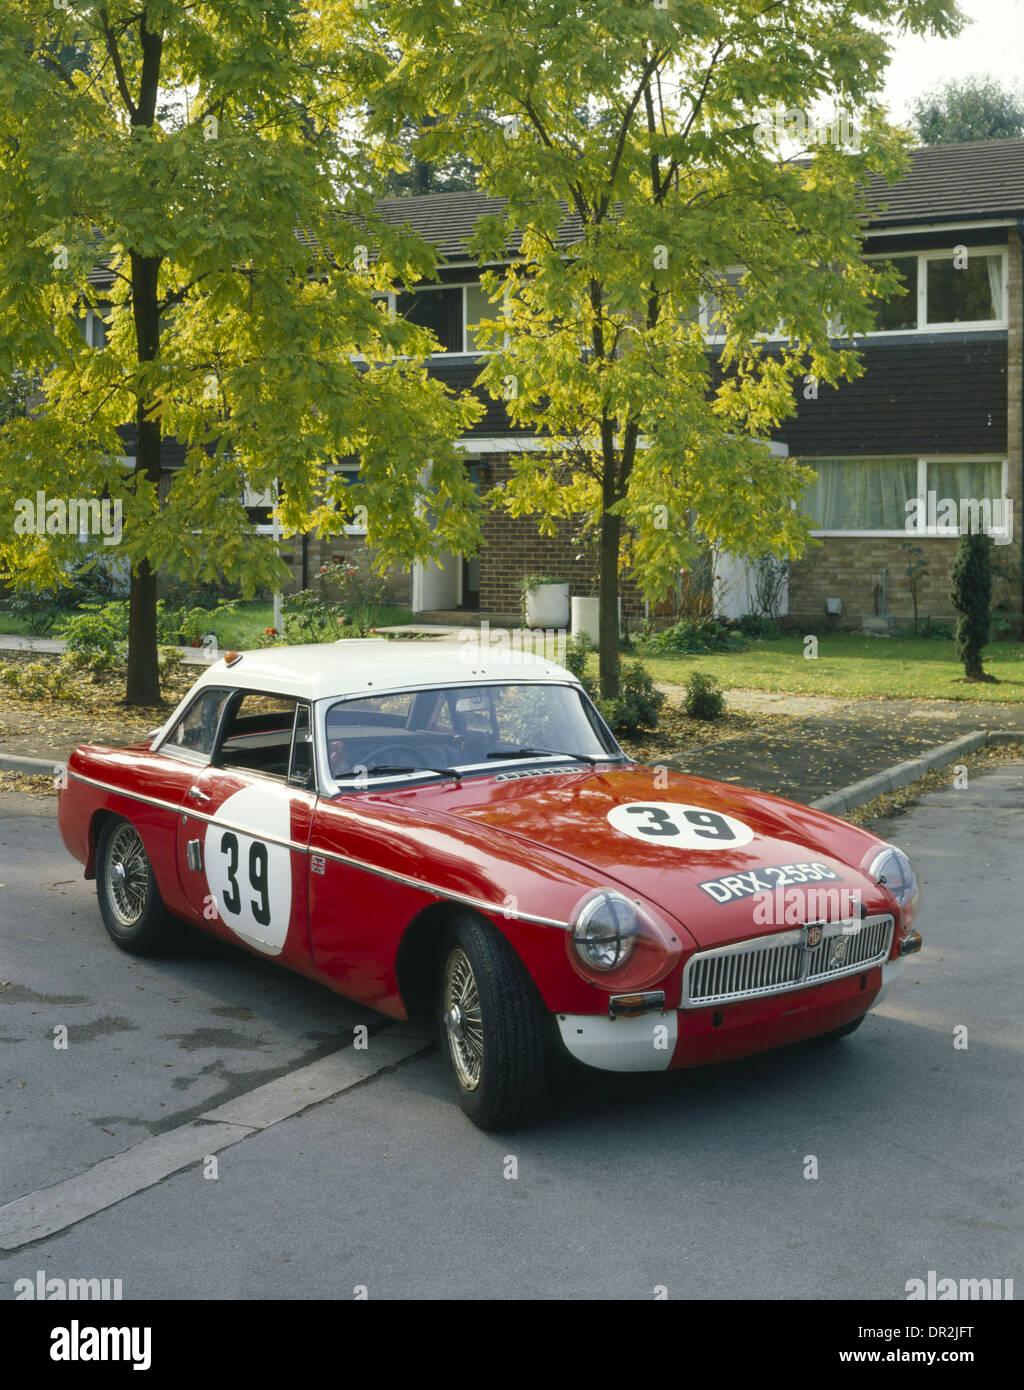 MG MGB - 1965 EX PADDY HOPKIRK LE MANS RACING CAR - classic race car ...